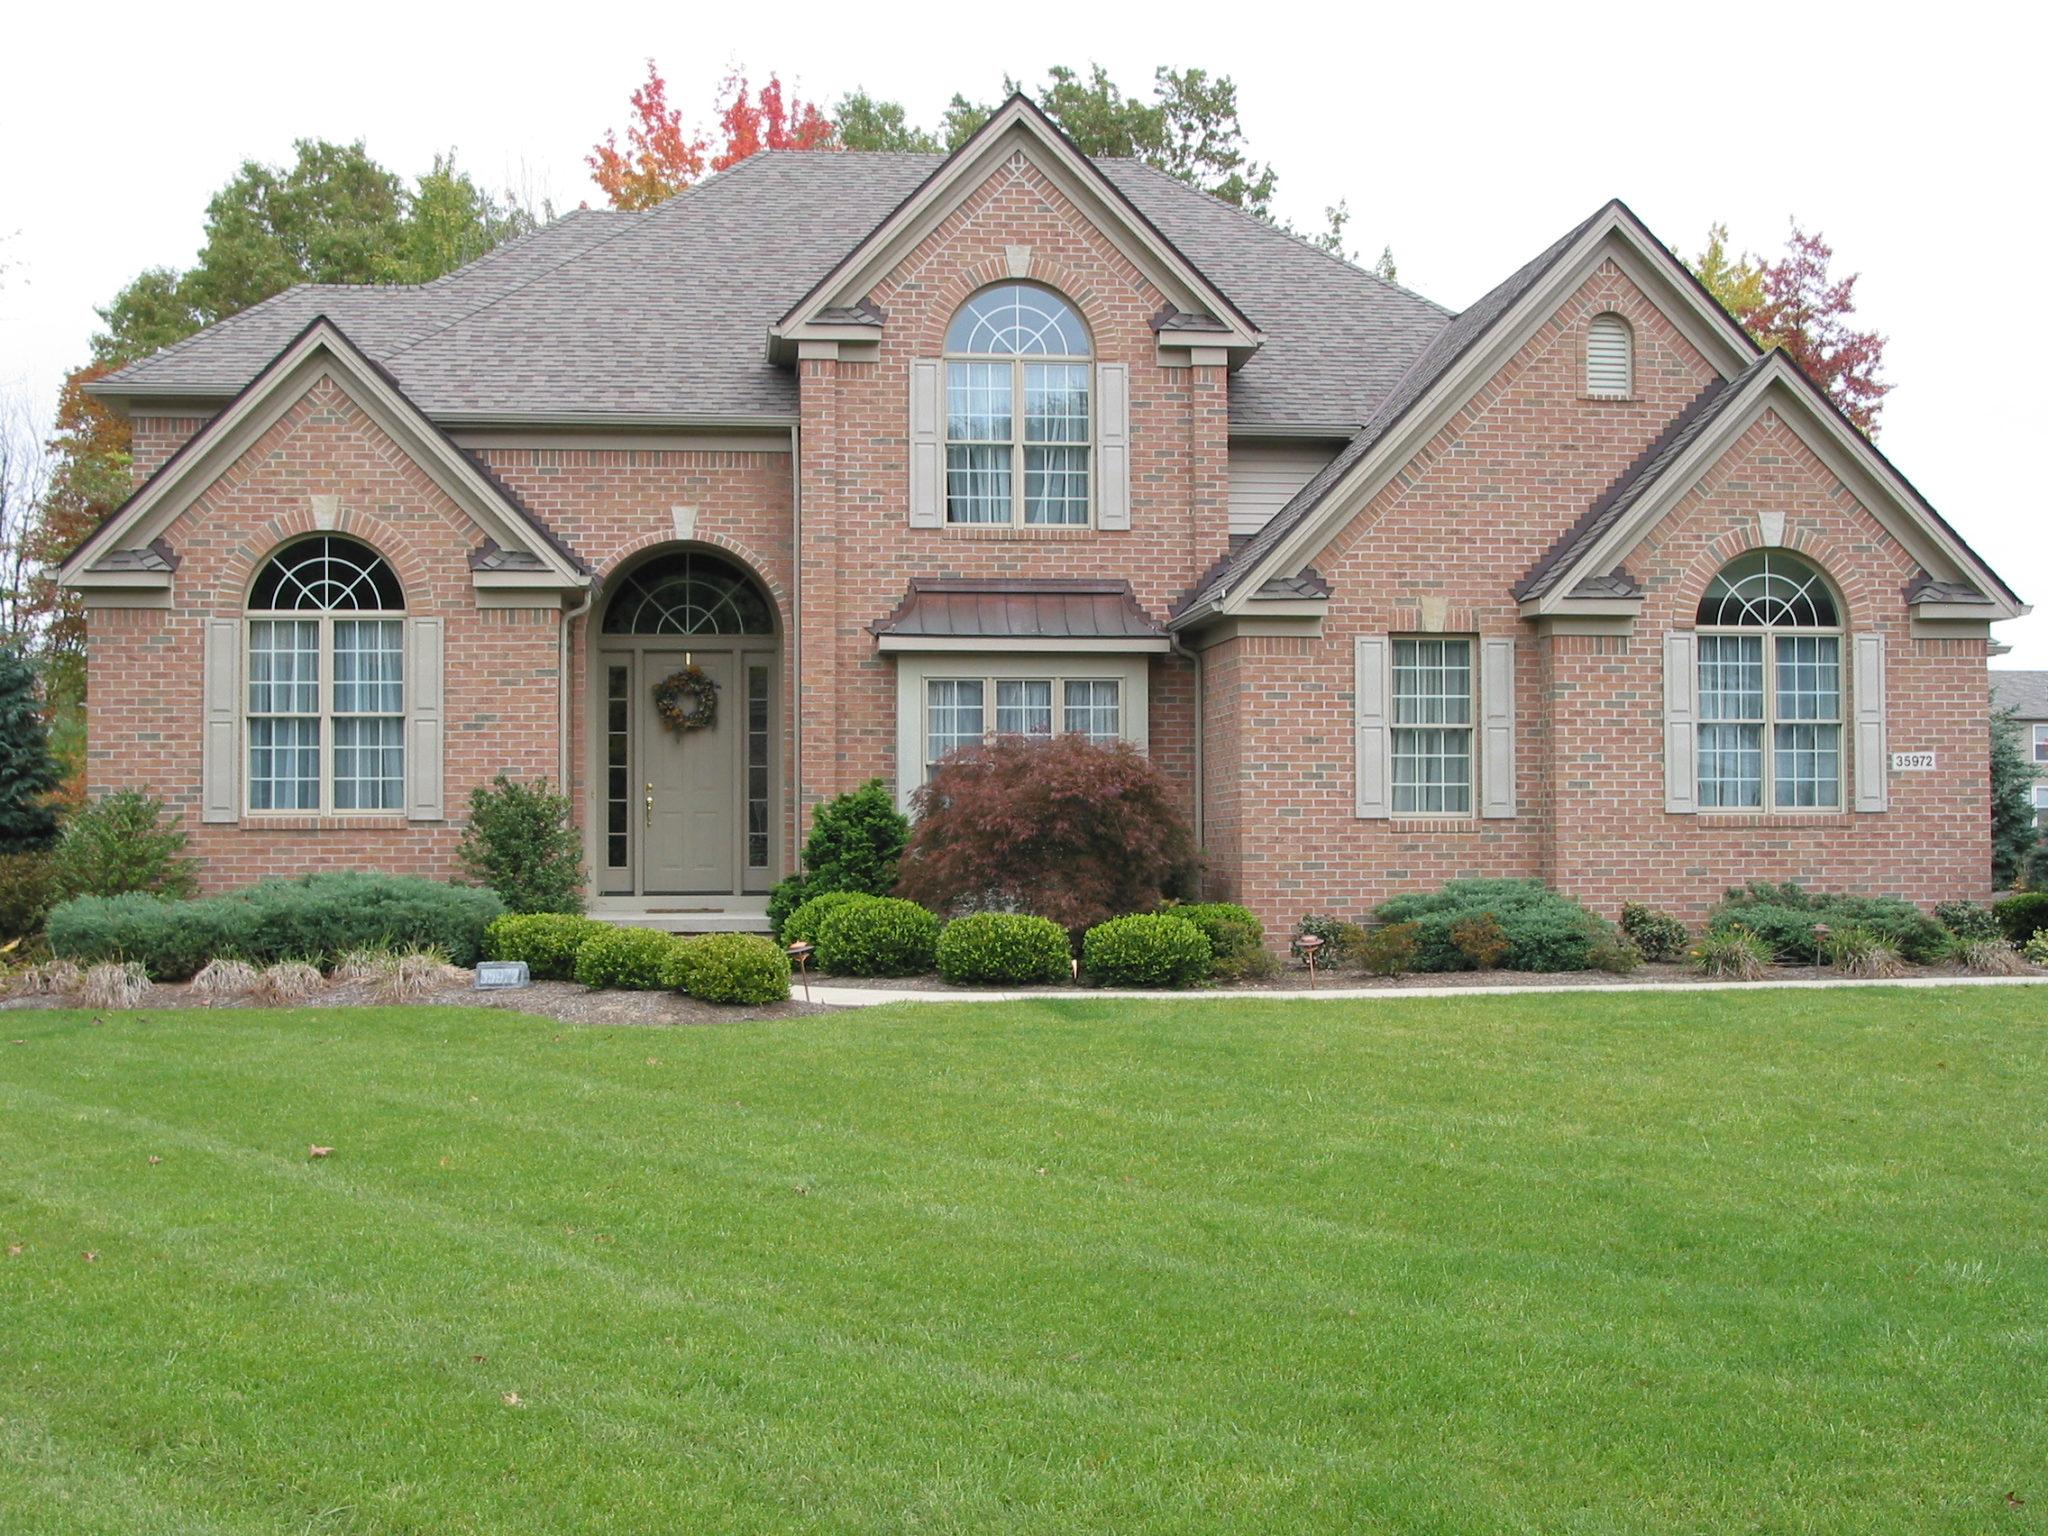 Galik Building, custom homes in Avon, OH